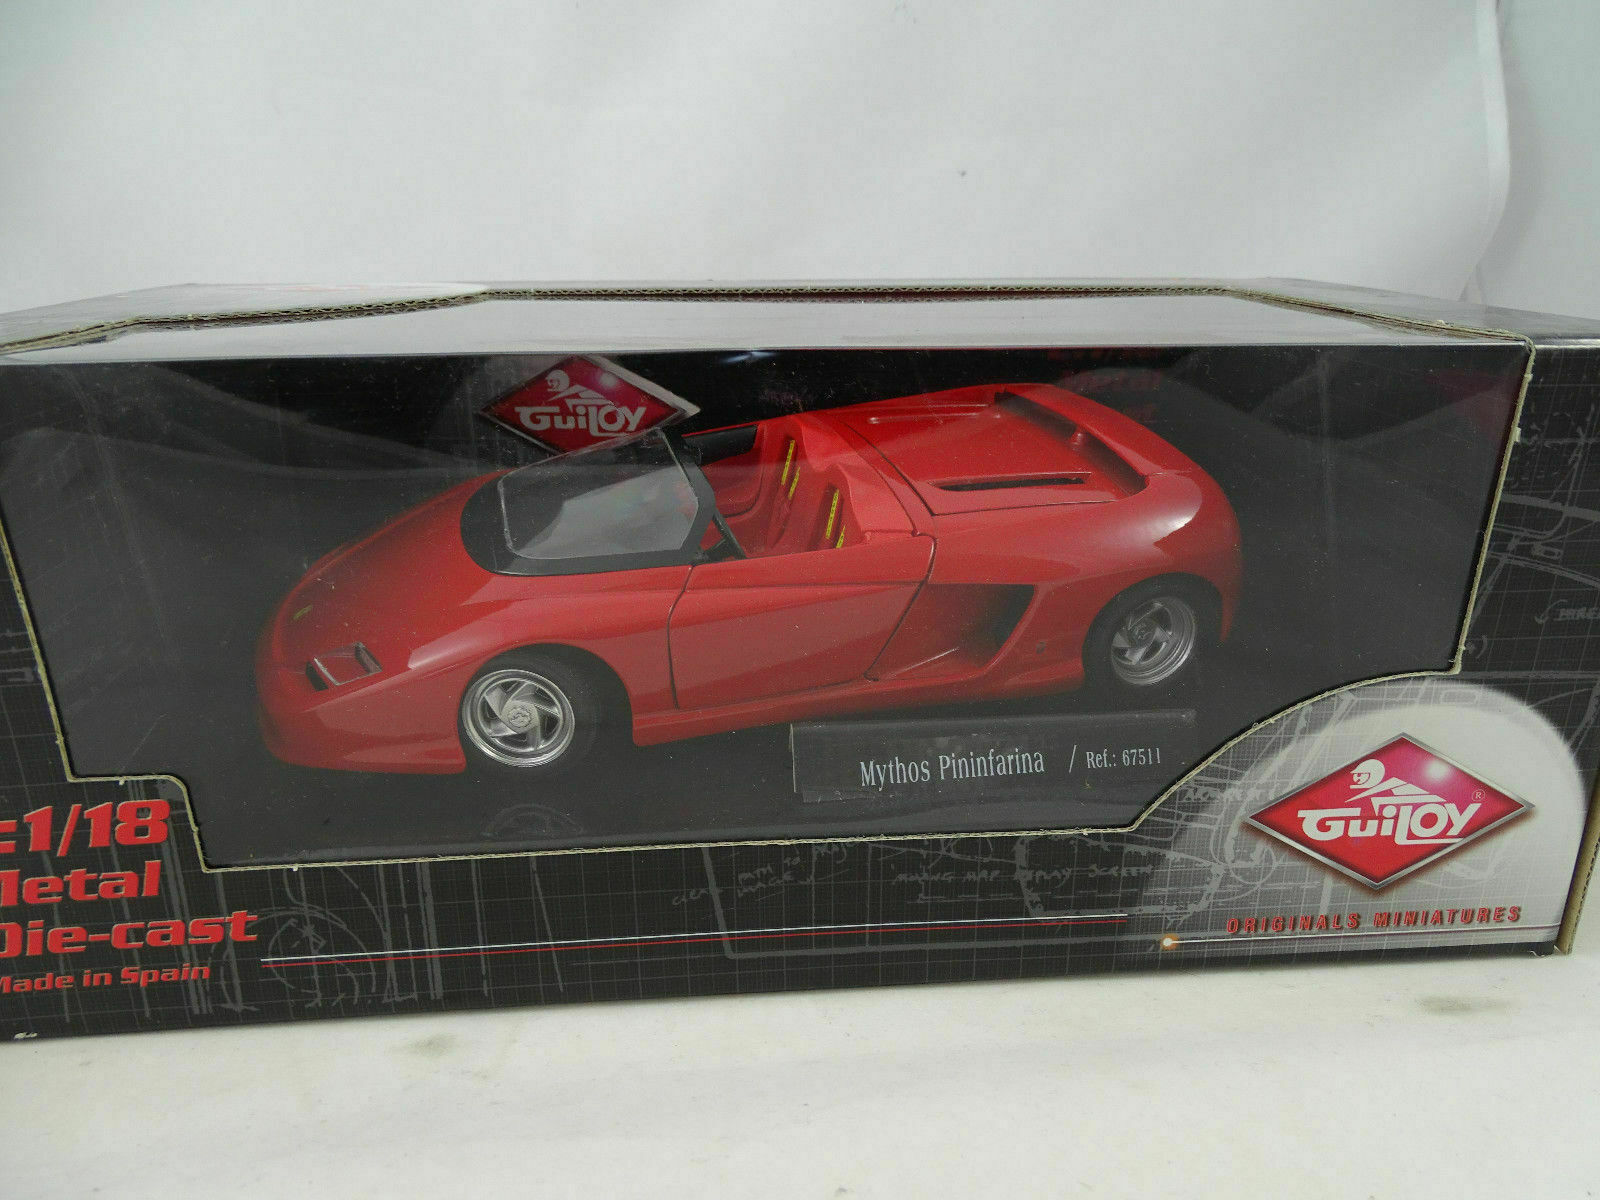 1 18 Guiloy  67511 Ferrari Mythos Pininfarina Rosso  Rarità